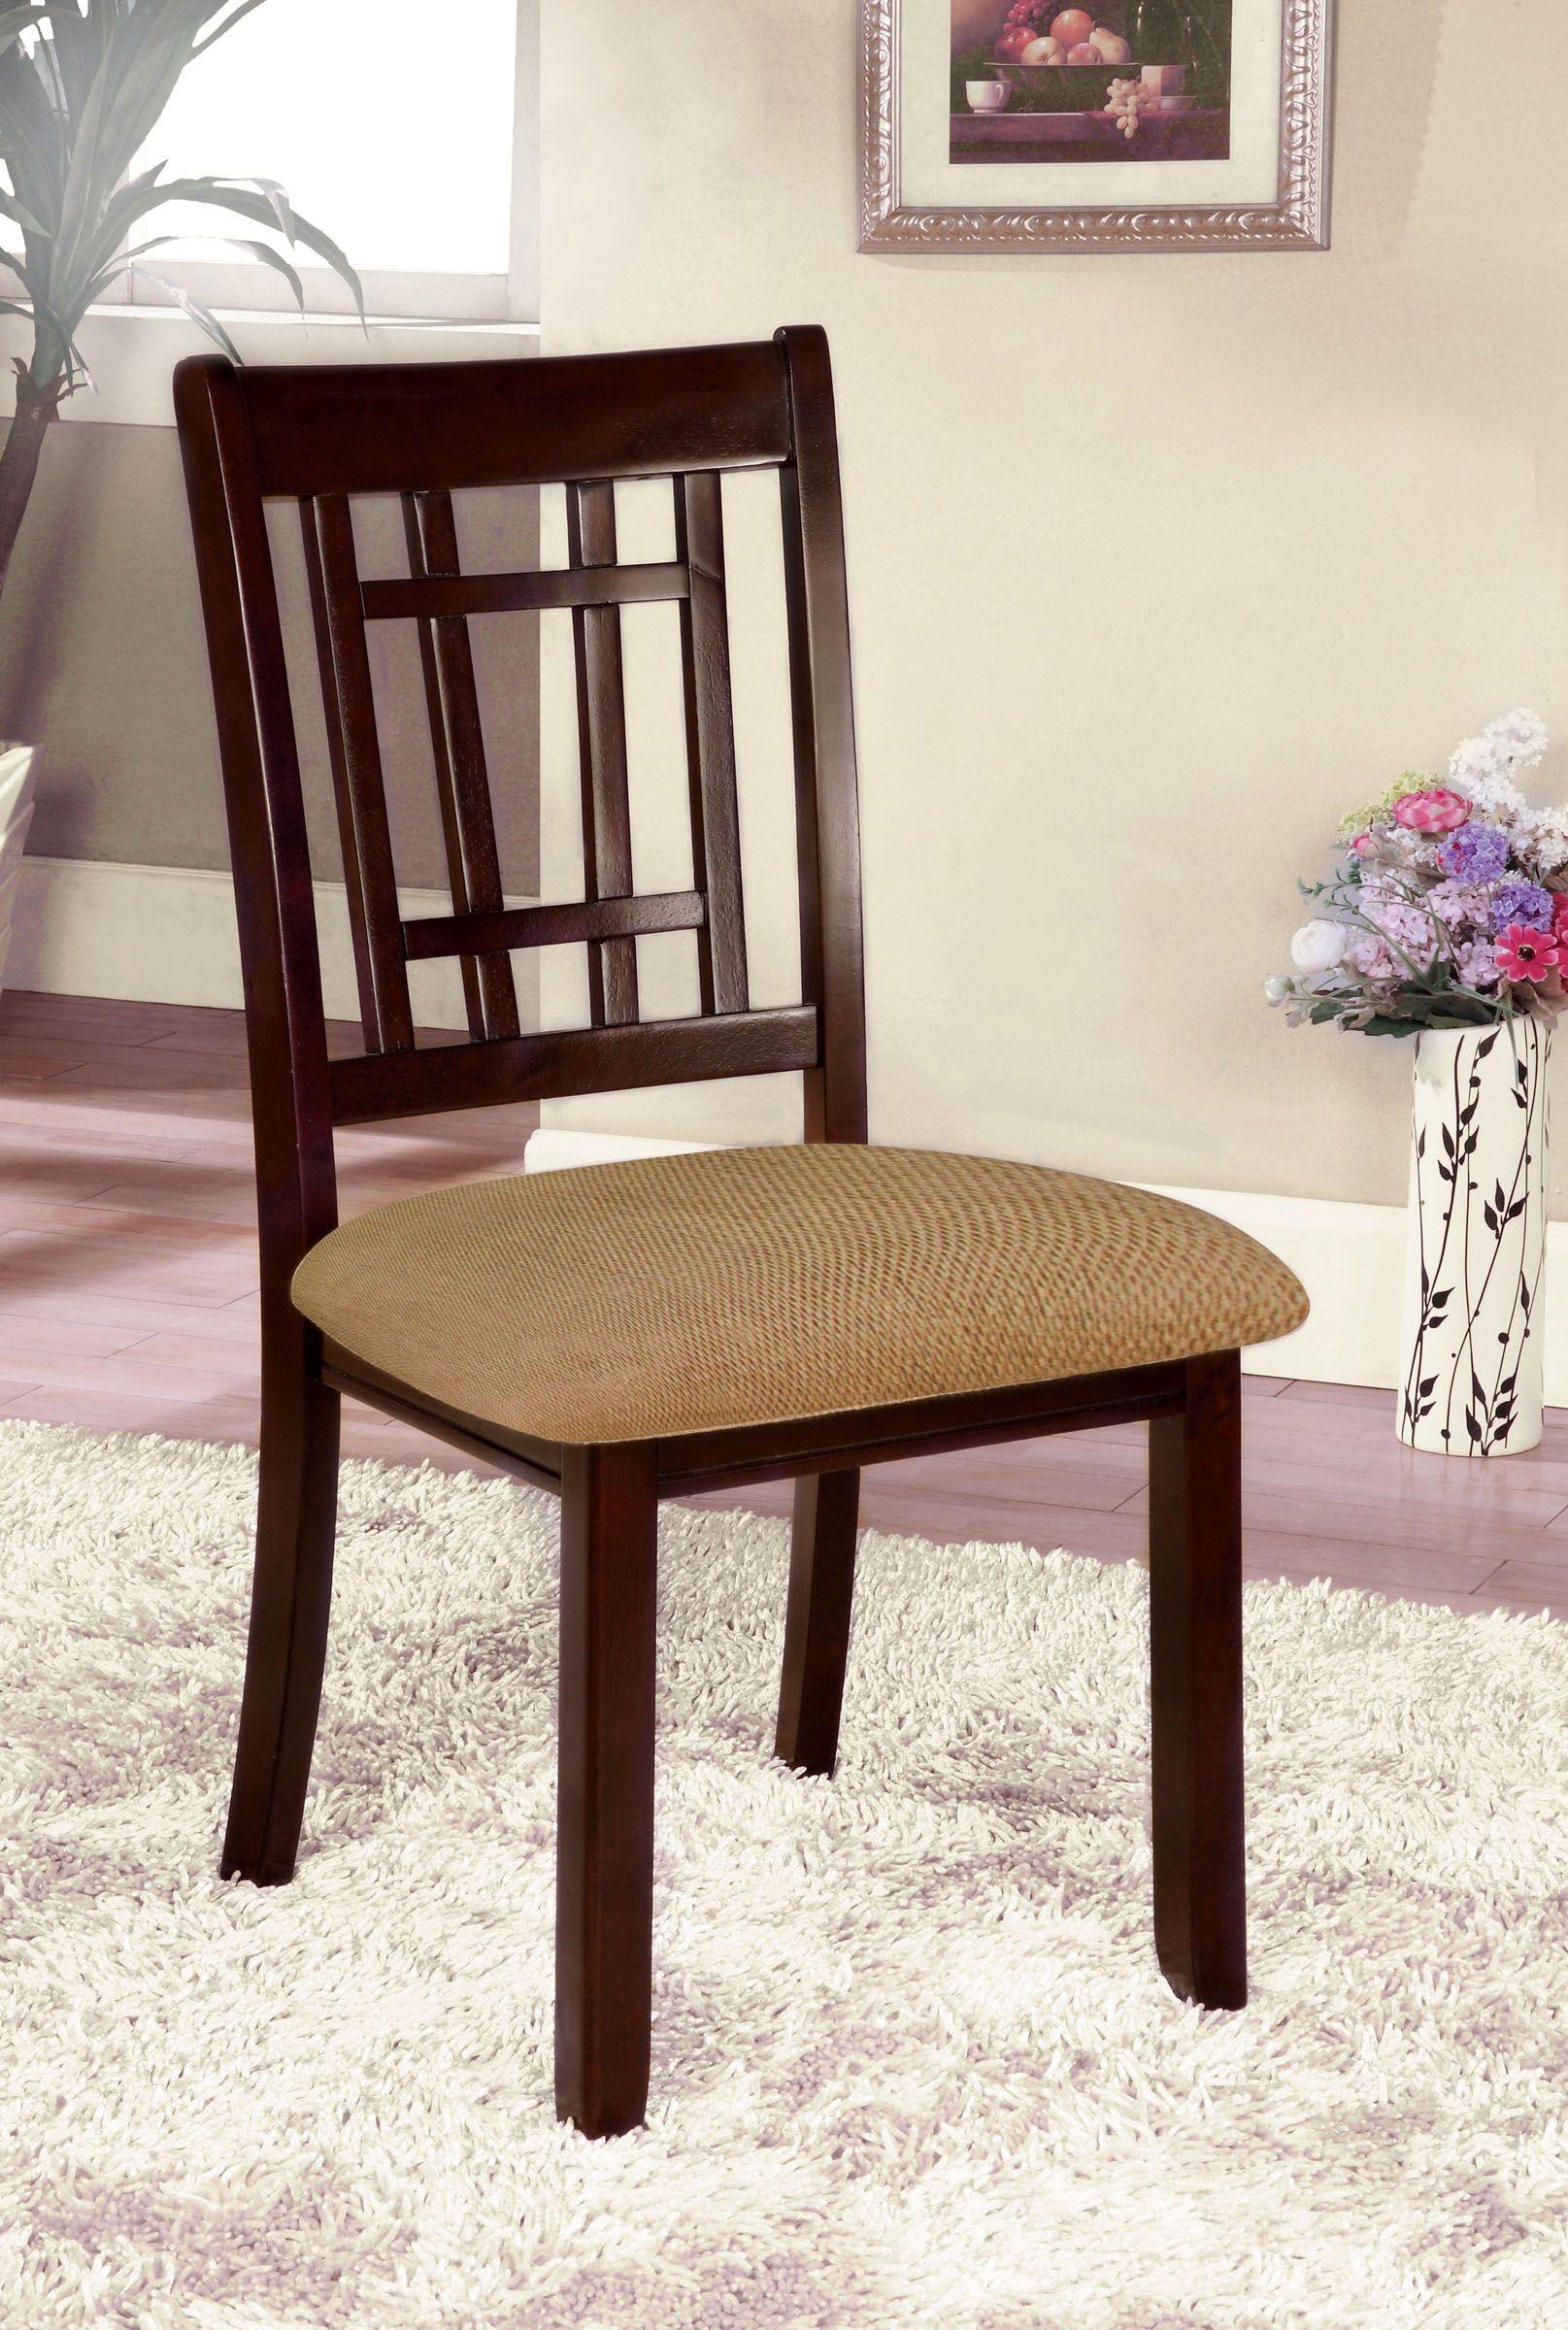 Furniture Of America Lennart Ii White Panel Bedroom Set: Furniture Of America Central Park I Dark Cherry